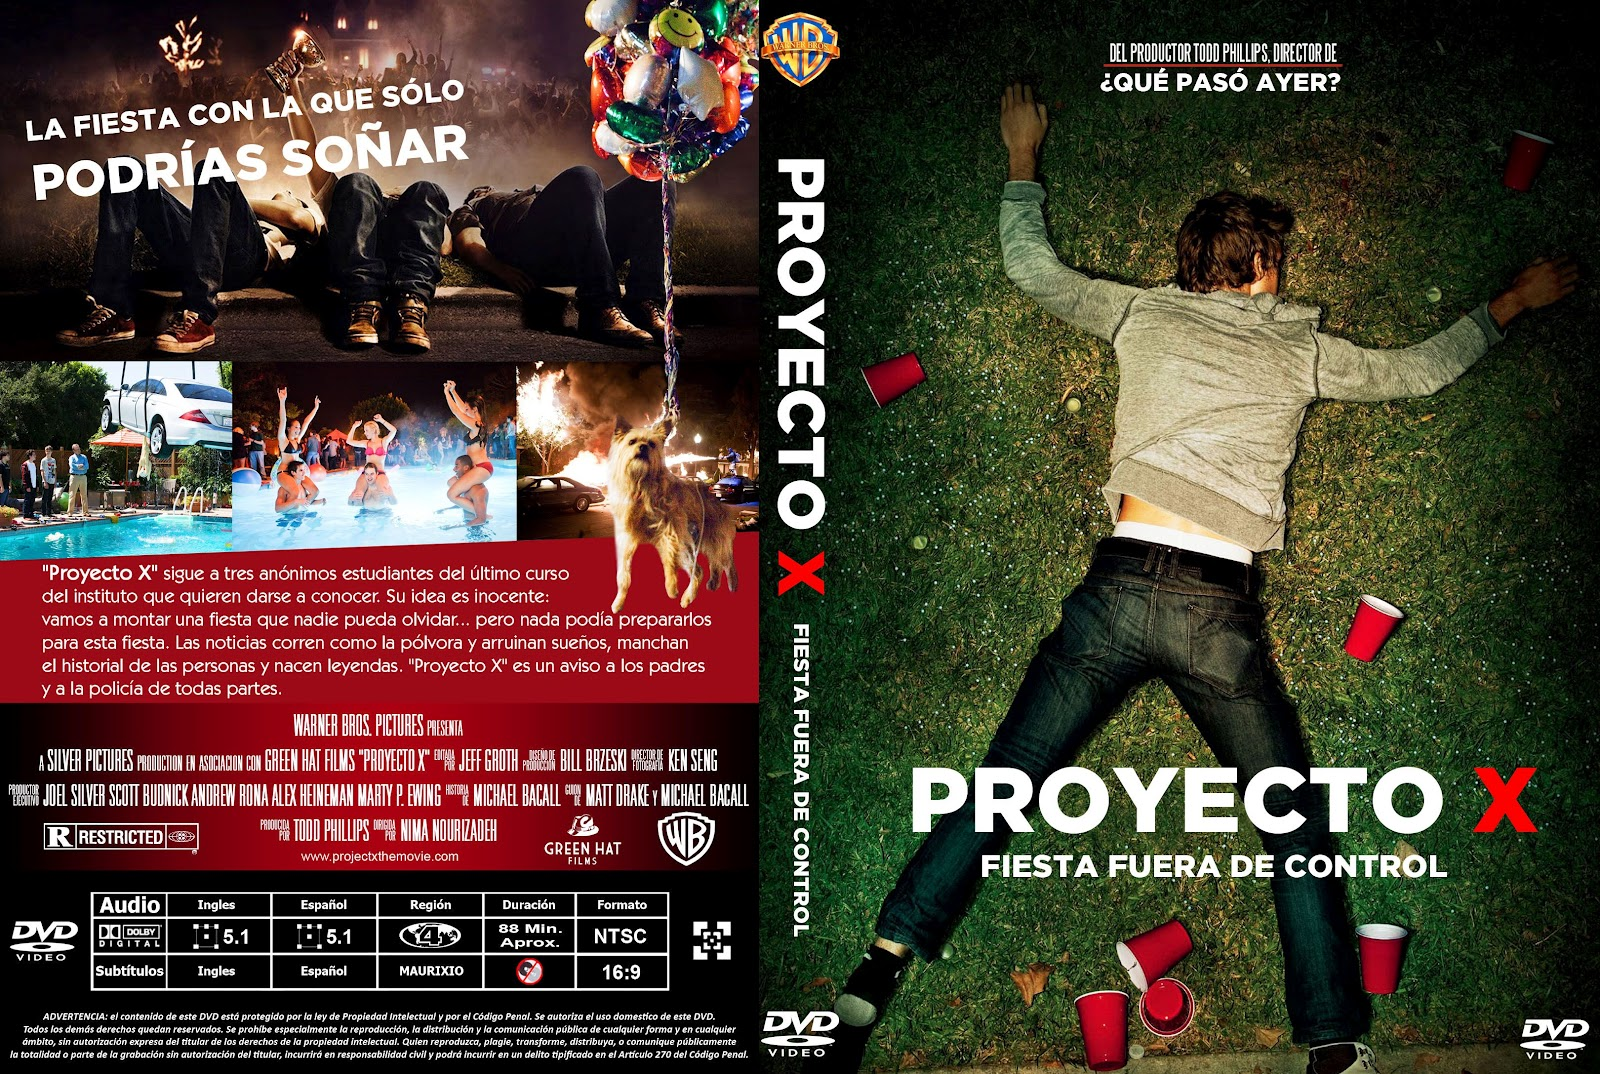 Mania digital proyecto x fiesta fuera de control 2012 for Fuera de control dmax